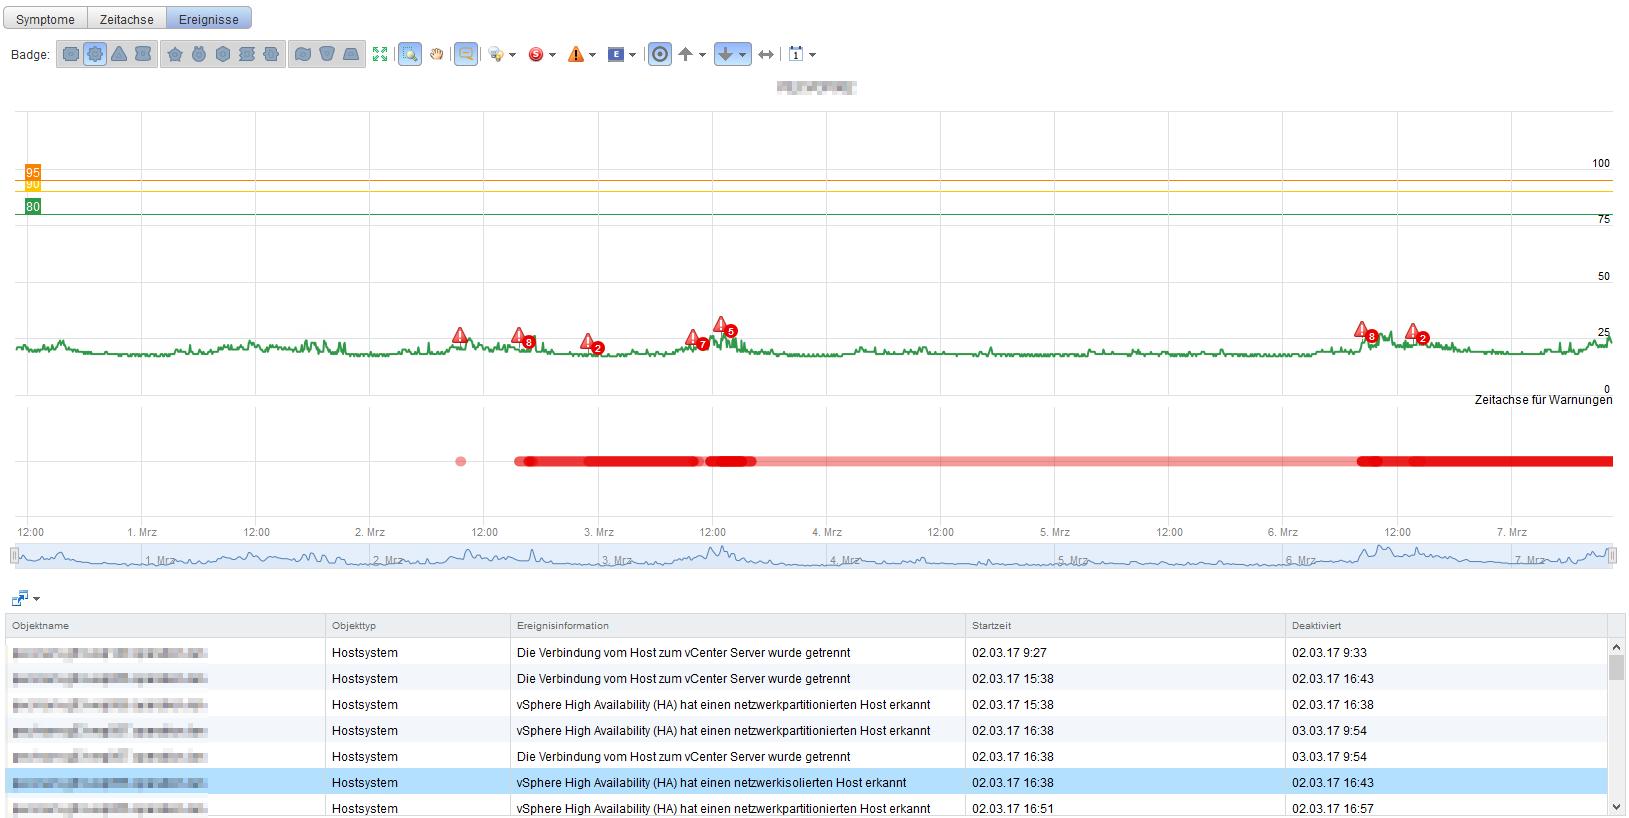 vRealize Operations Manager - Ereignisse - vSphere HA isolation Events